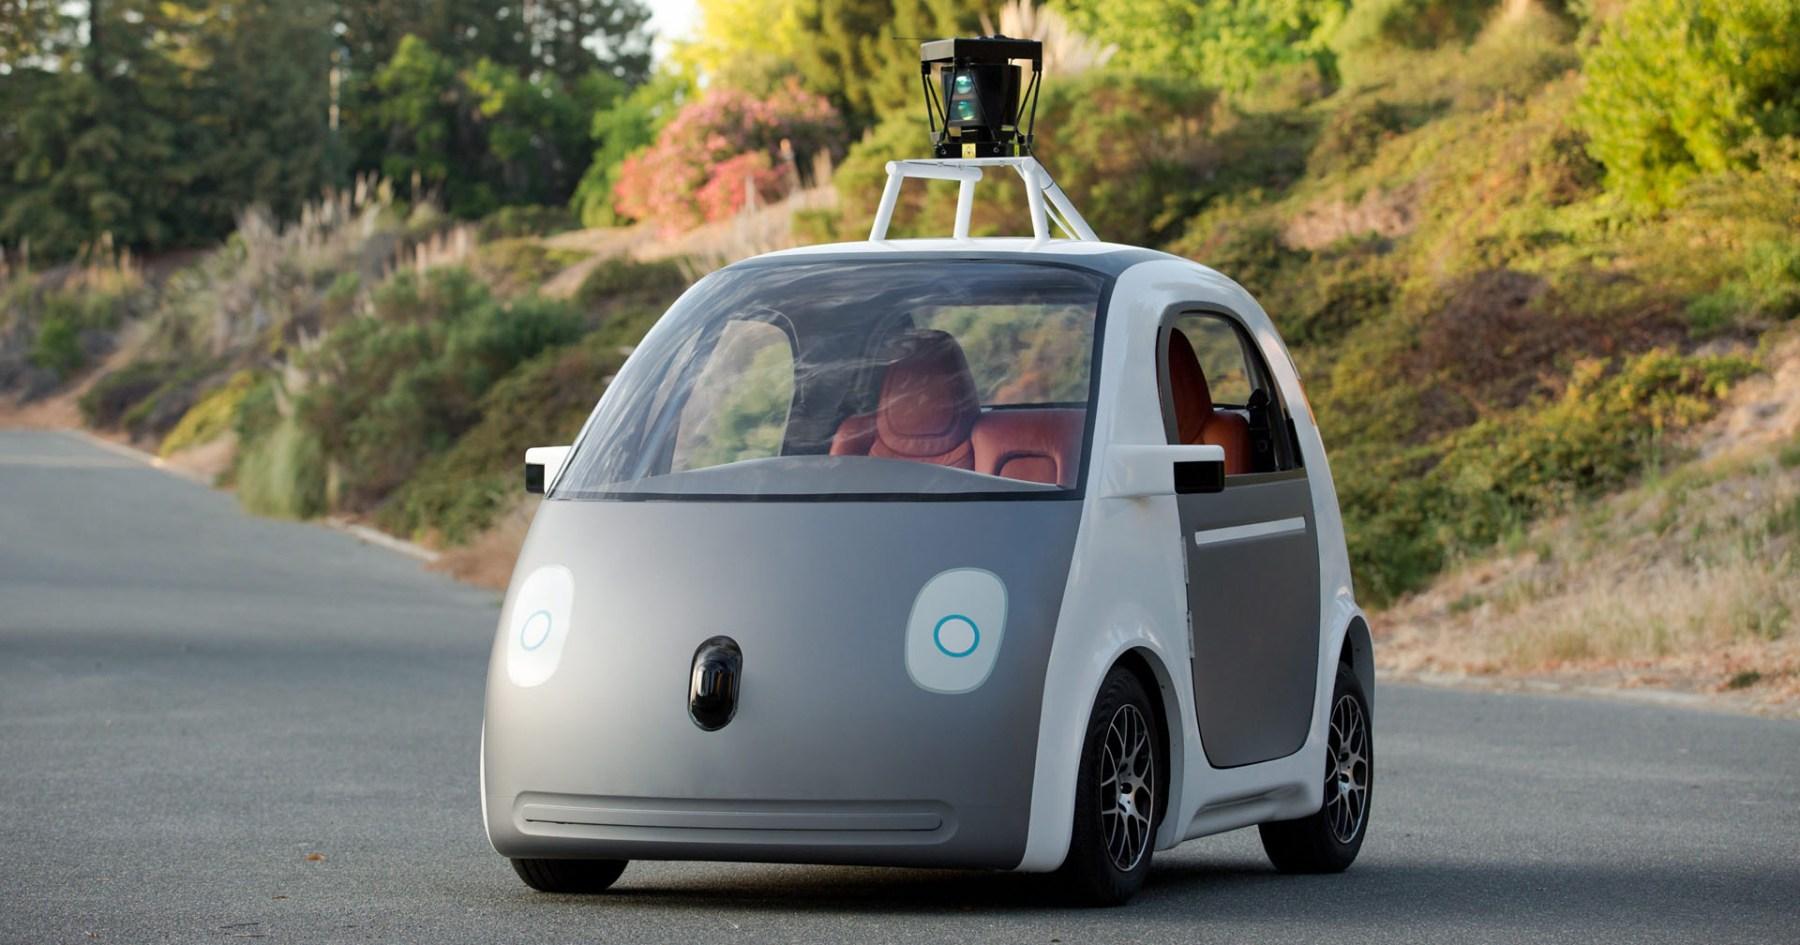 Will Autonomous Cars or Public Transit Win the Future of Driving?